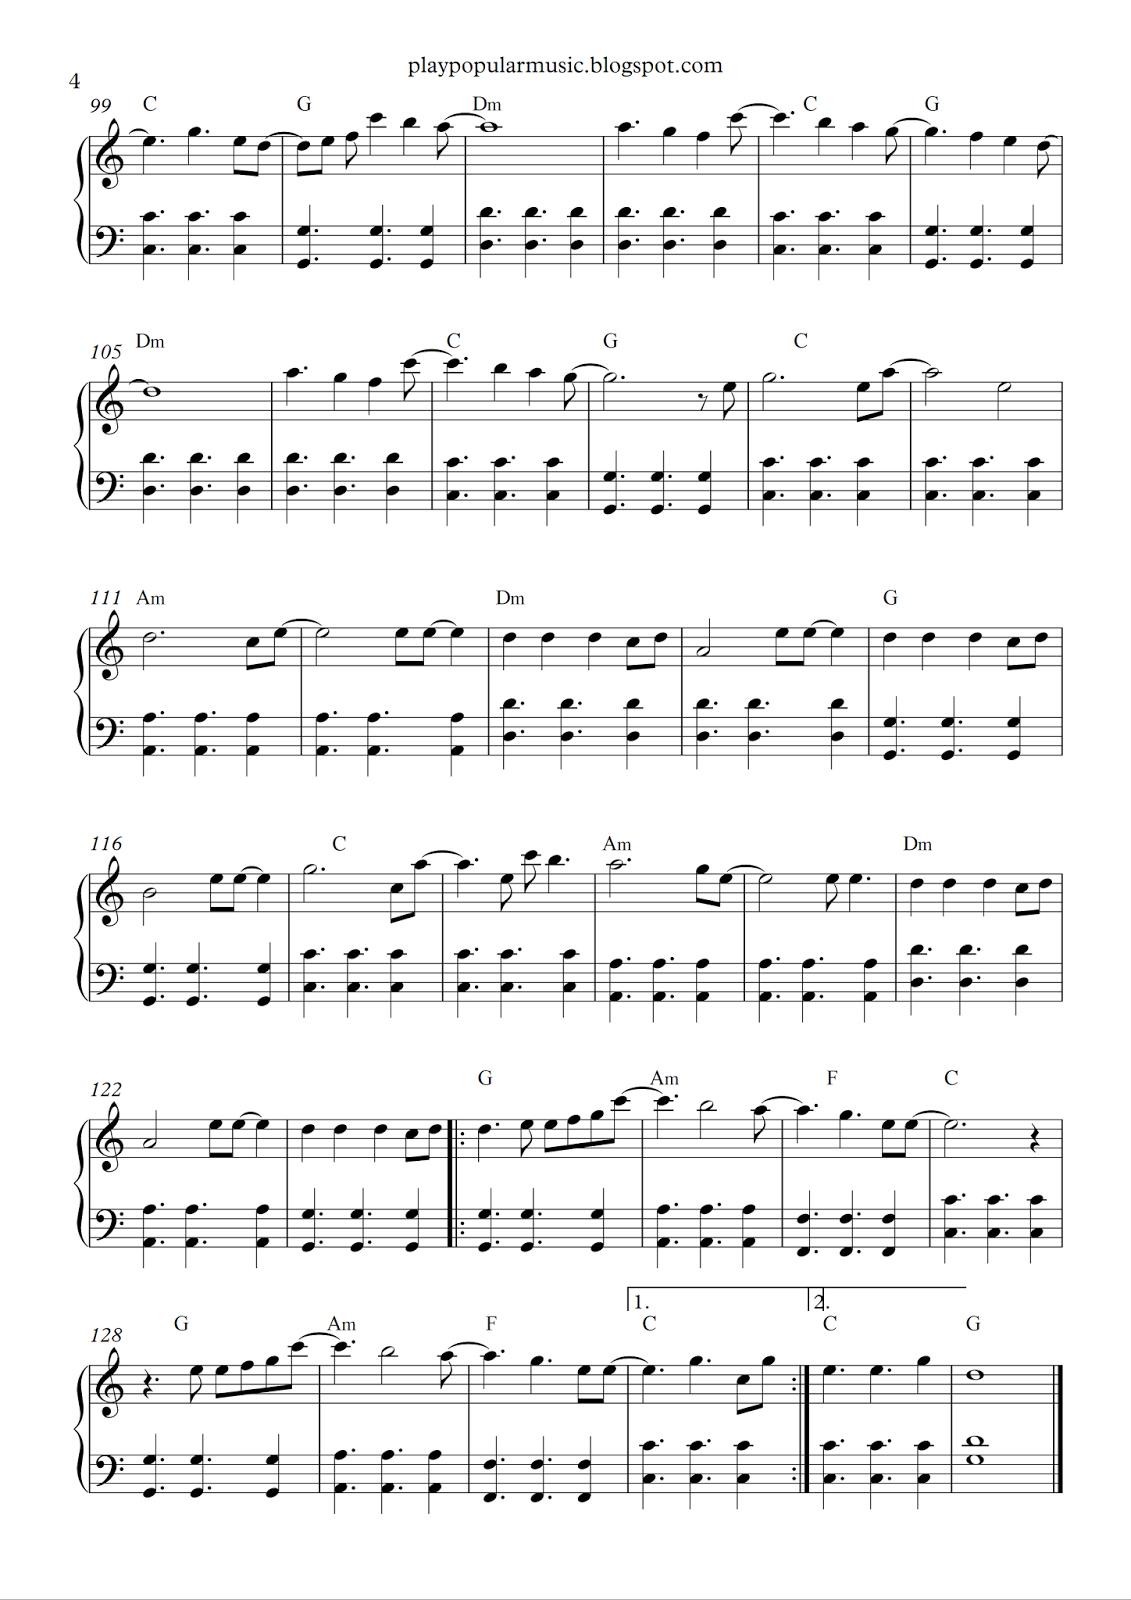 Free Piano Sheet Music: All Of Me - John Legend.pdf What's Going On - All Of Me Easy Piano Sheet Music Free Printable